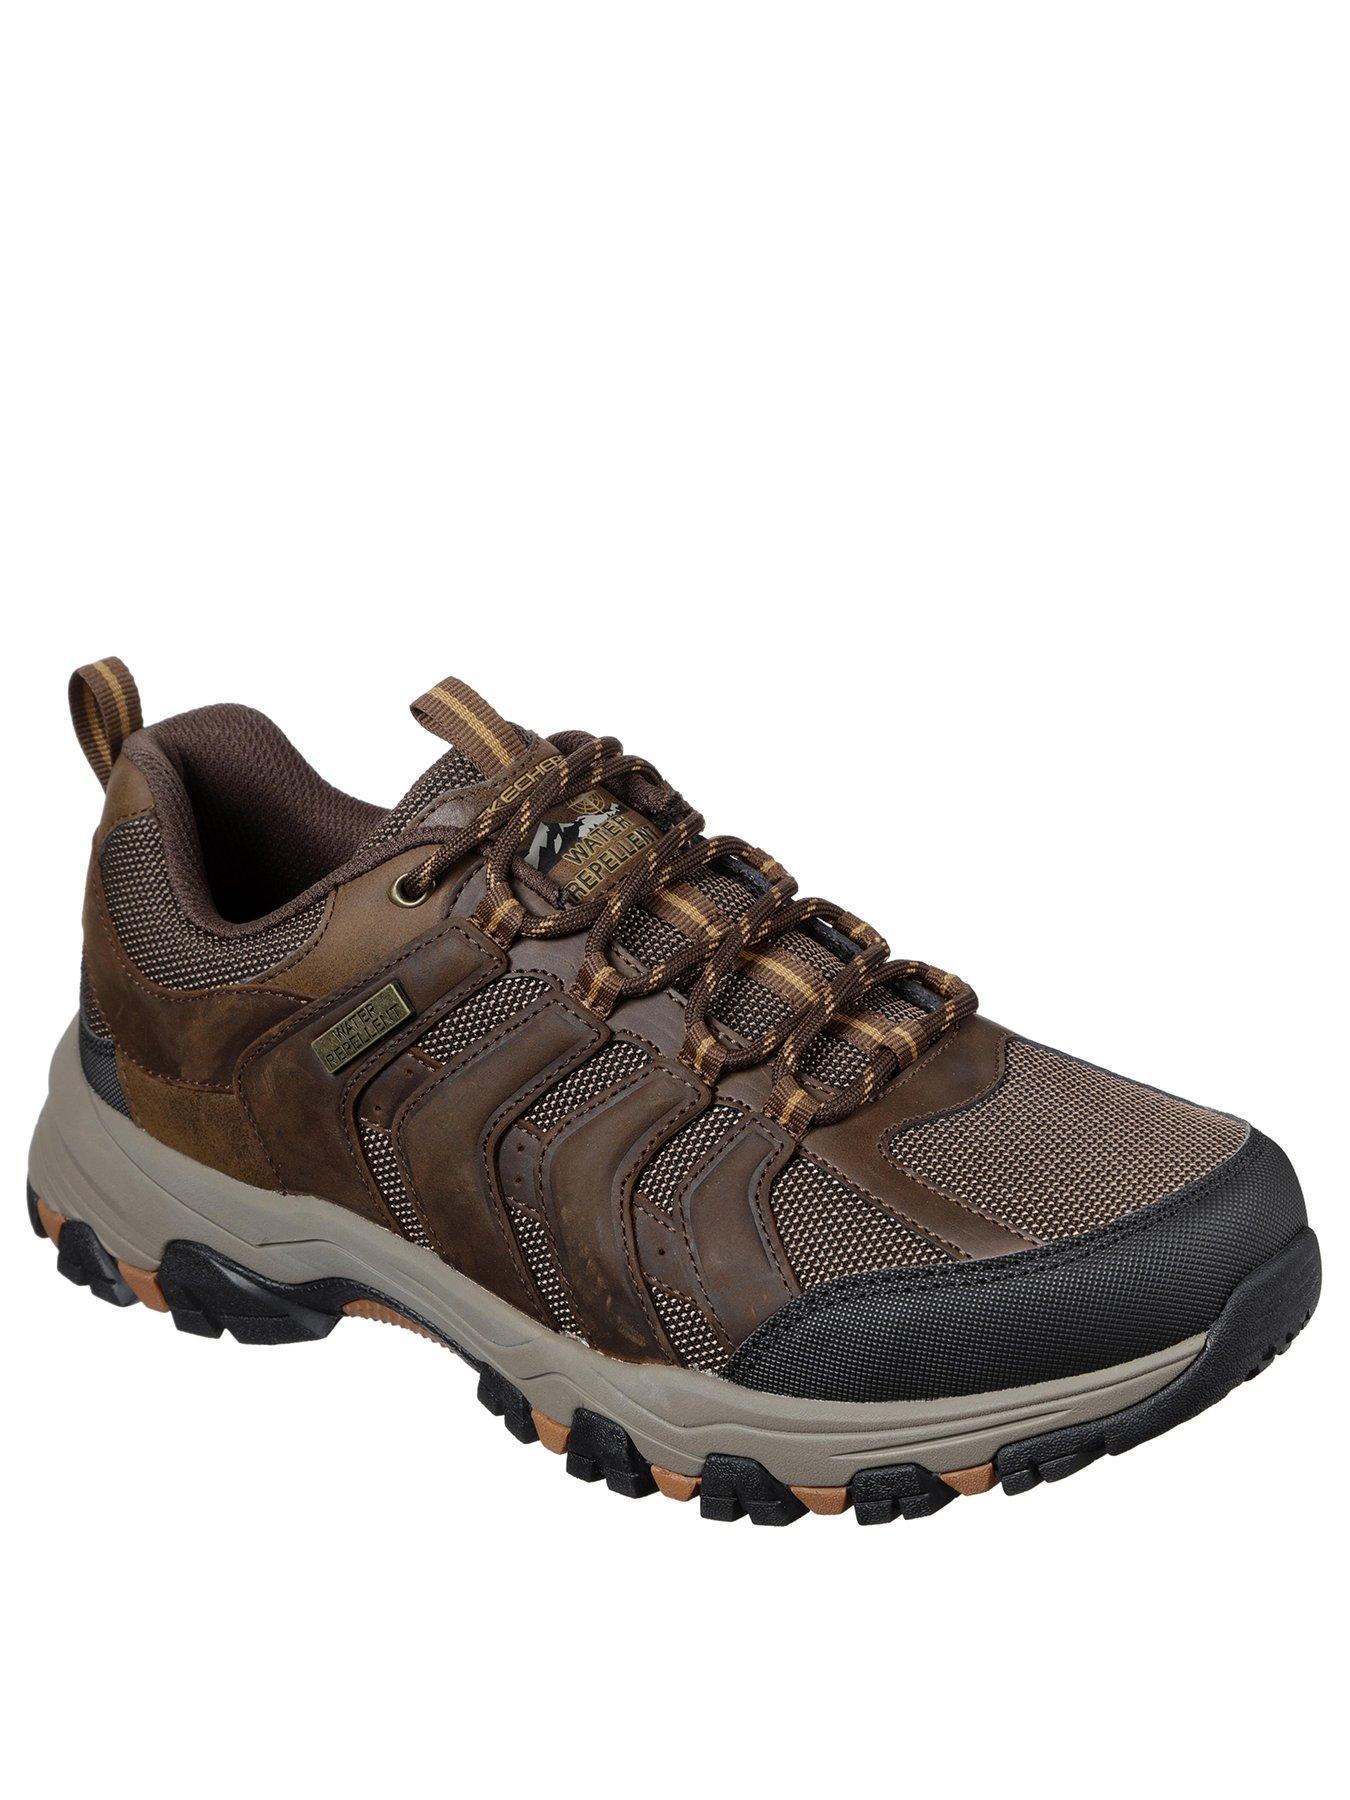 Skechers Shoes \u0026 Trainers